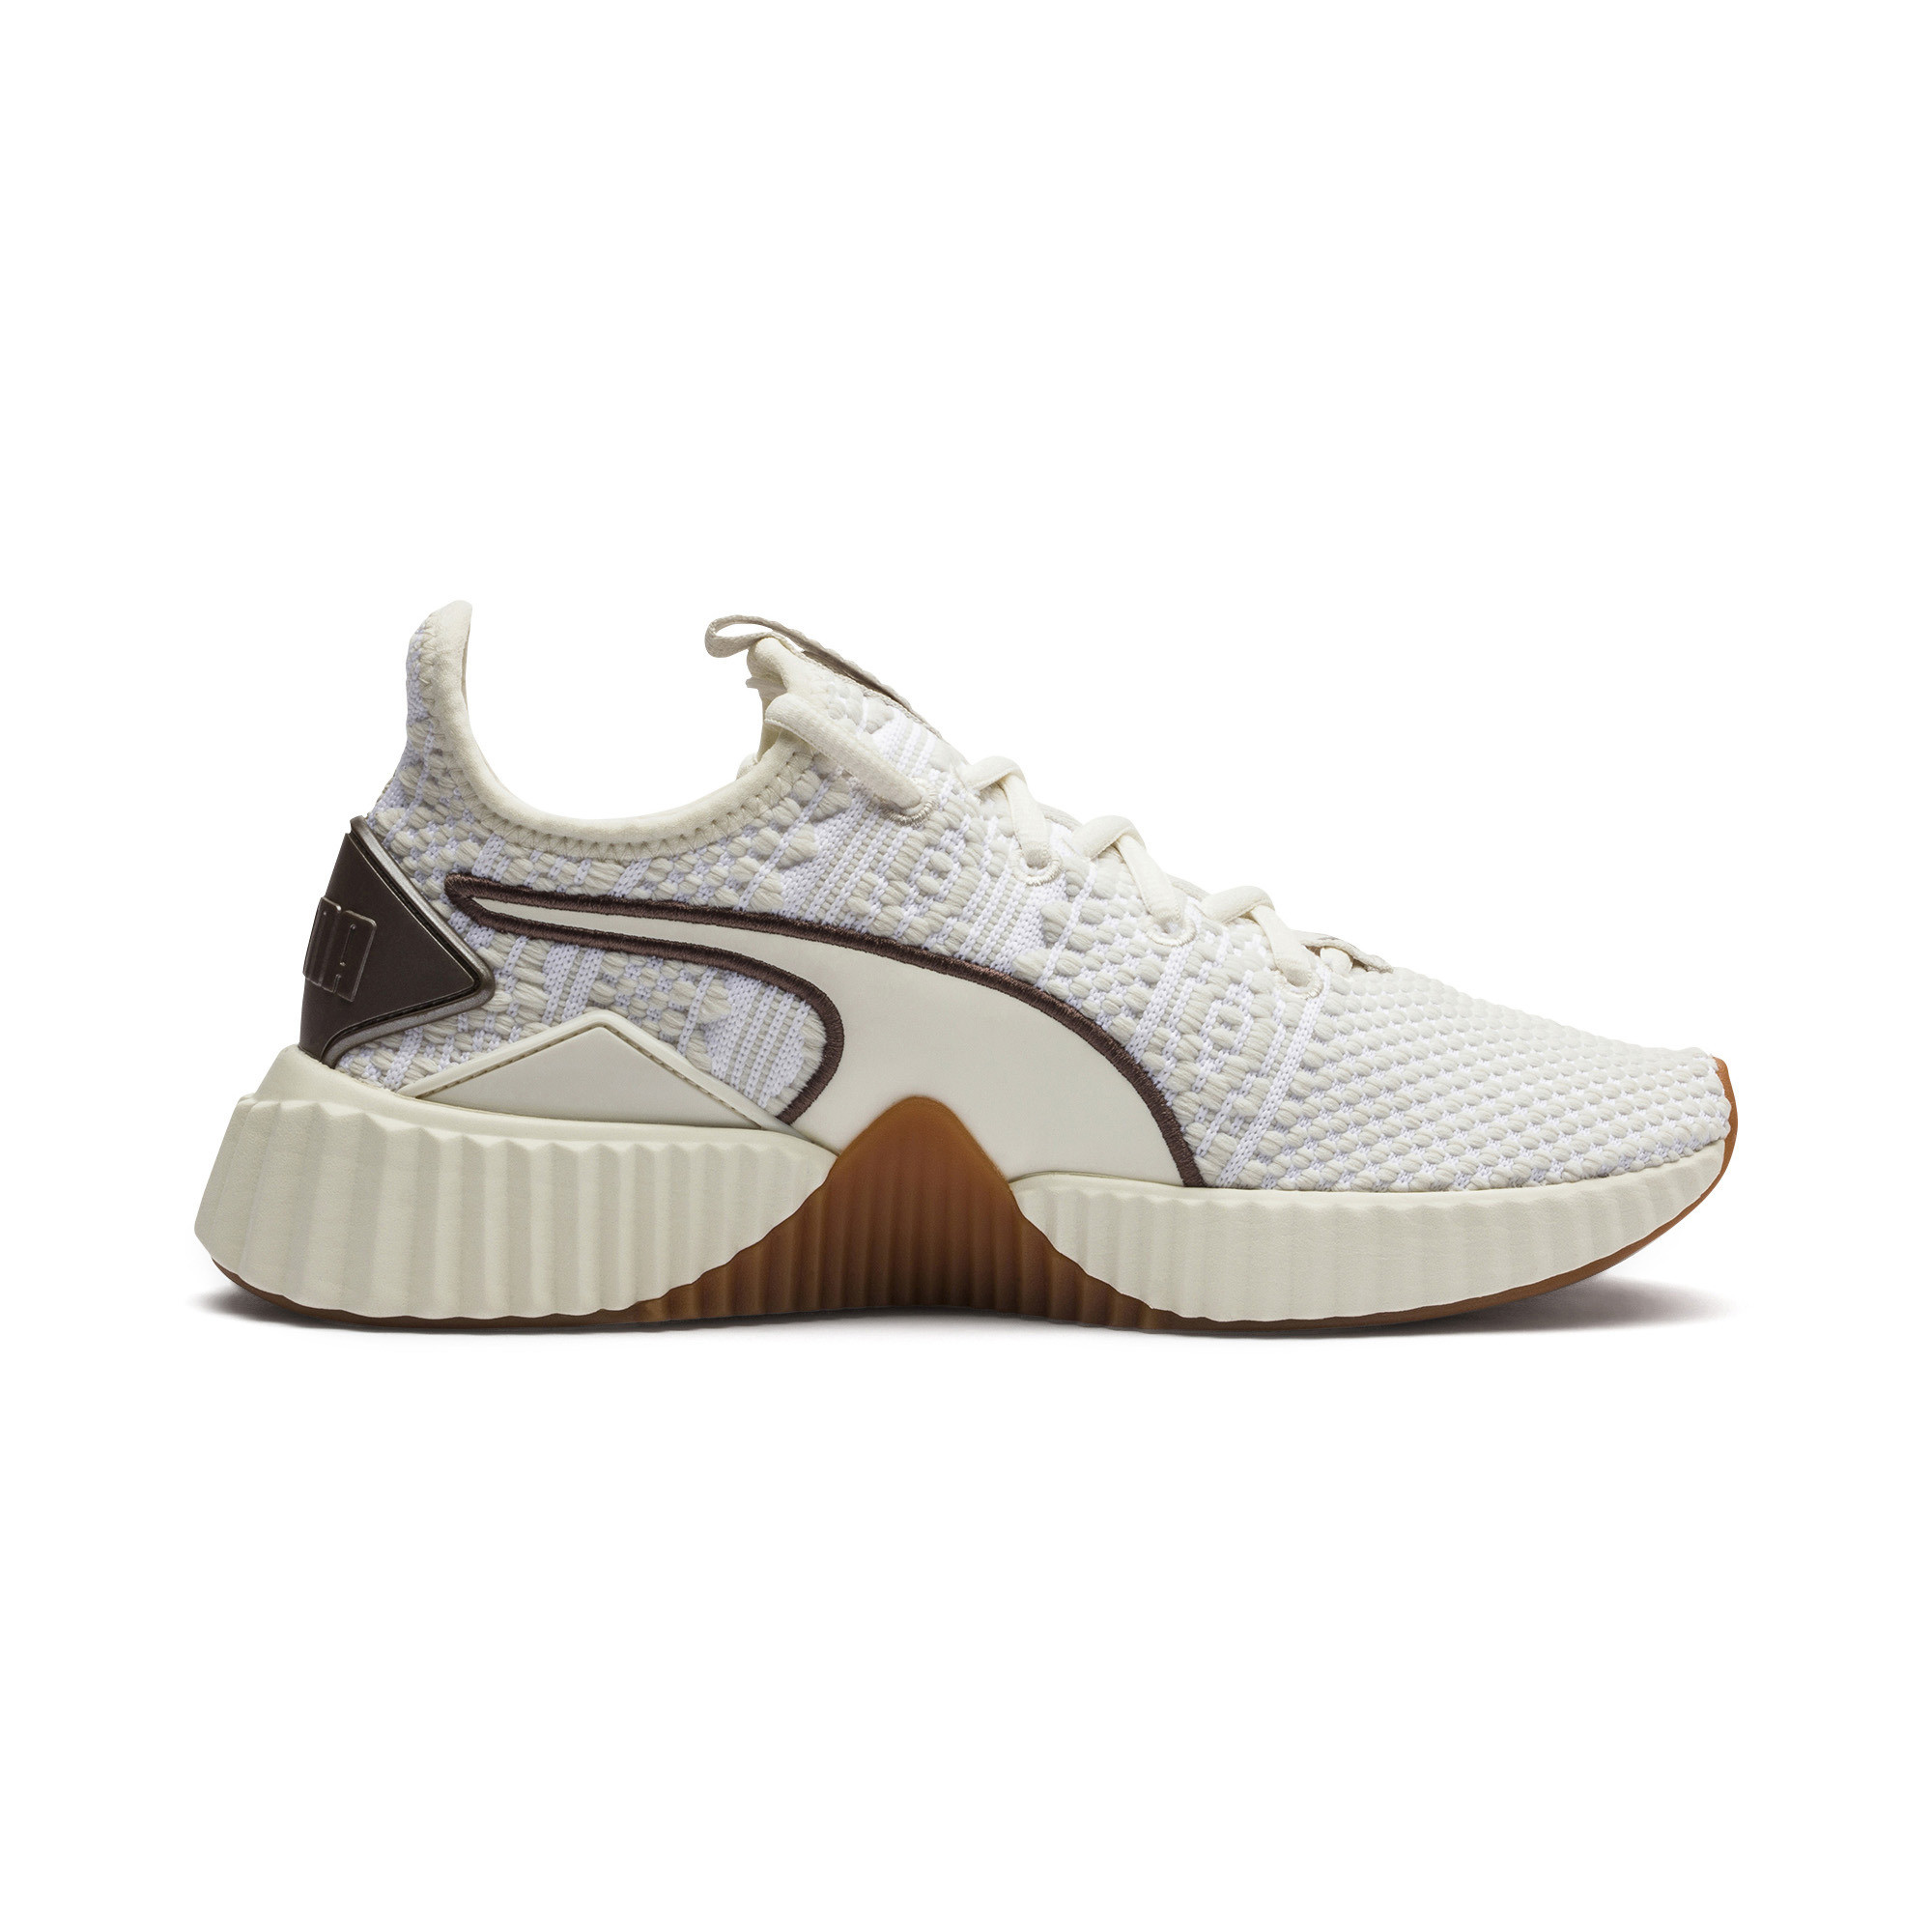 Image Puma Defy Luxe Women's Sneakers #5